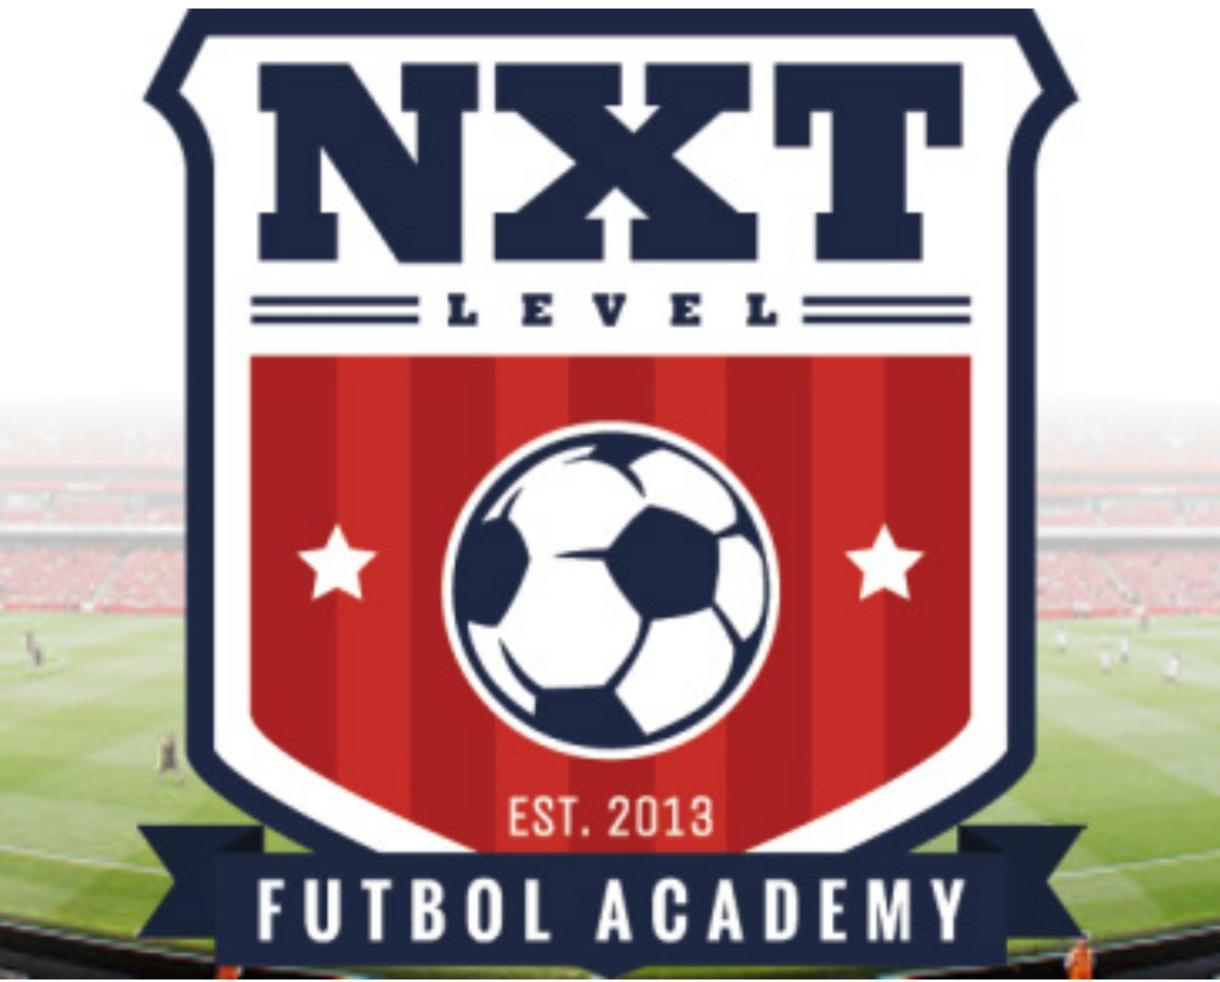 NXT Level Futbol Academy Camp at Bishop O'Connell High School